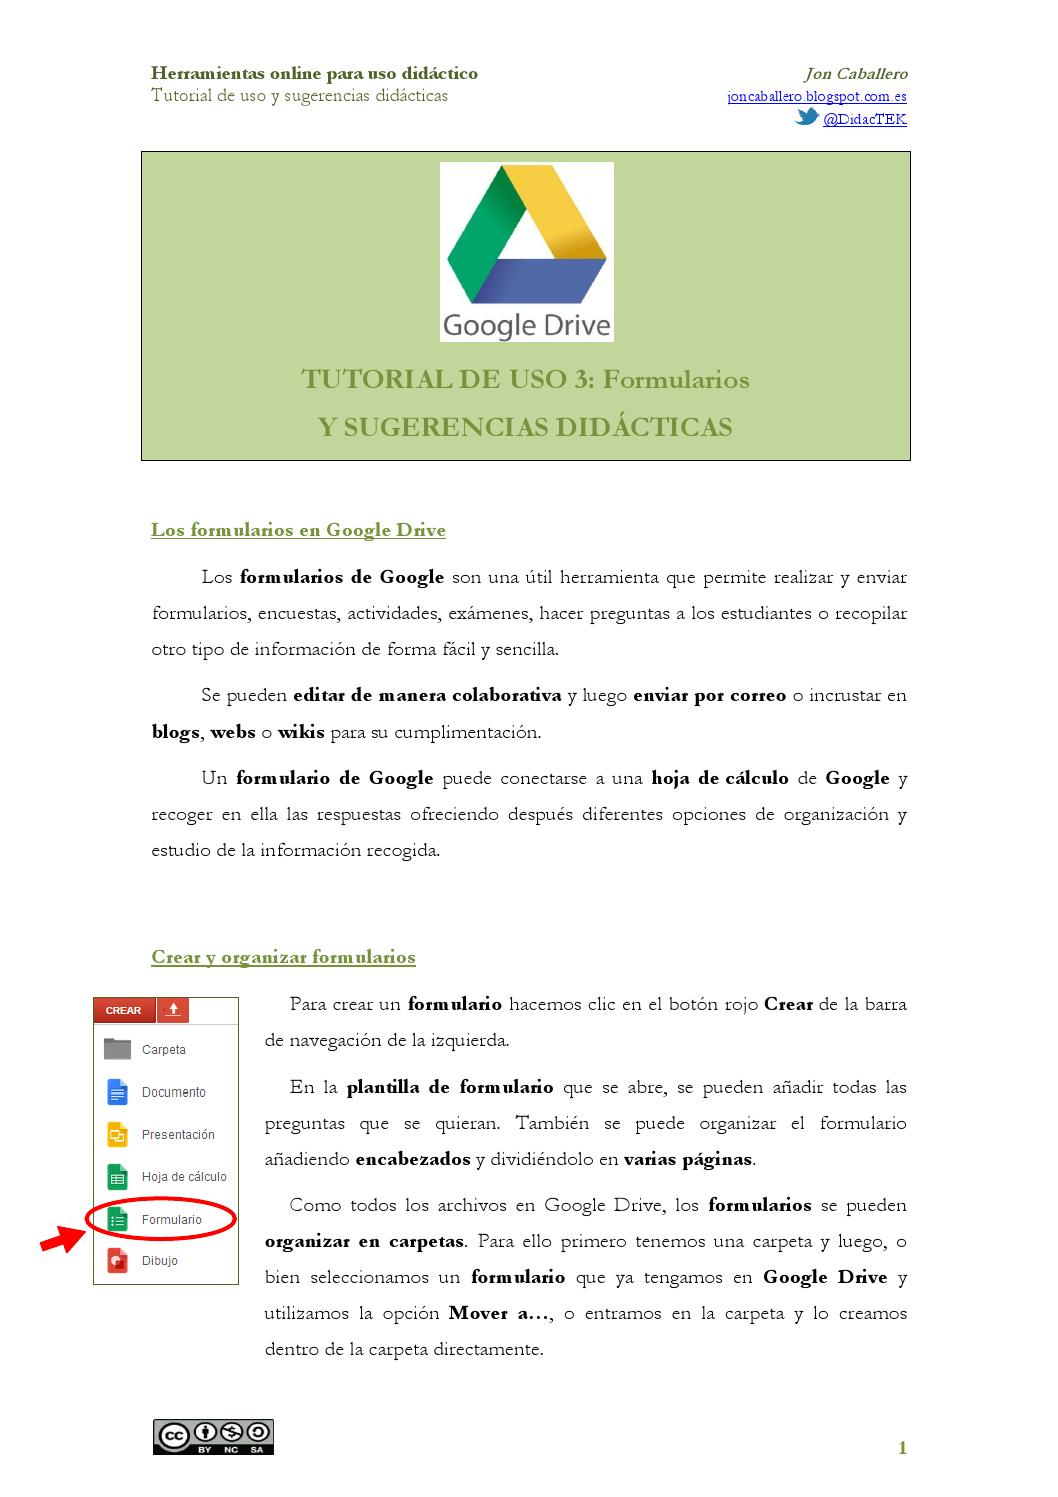 Tutorial googledrive 3 formularios by joncaballero - issuu